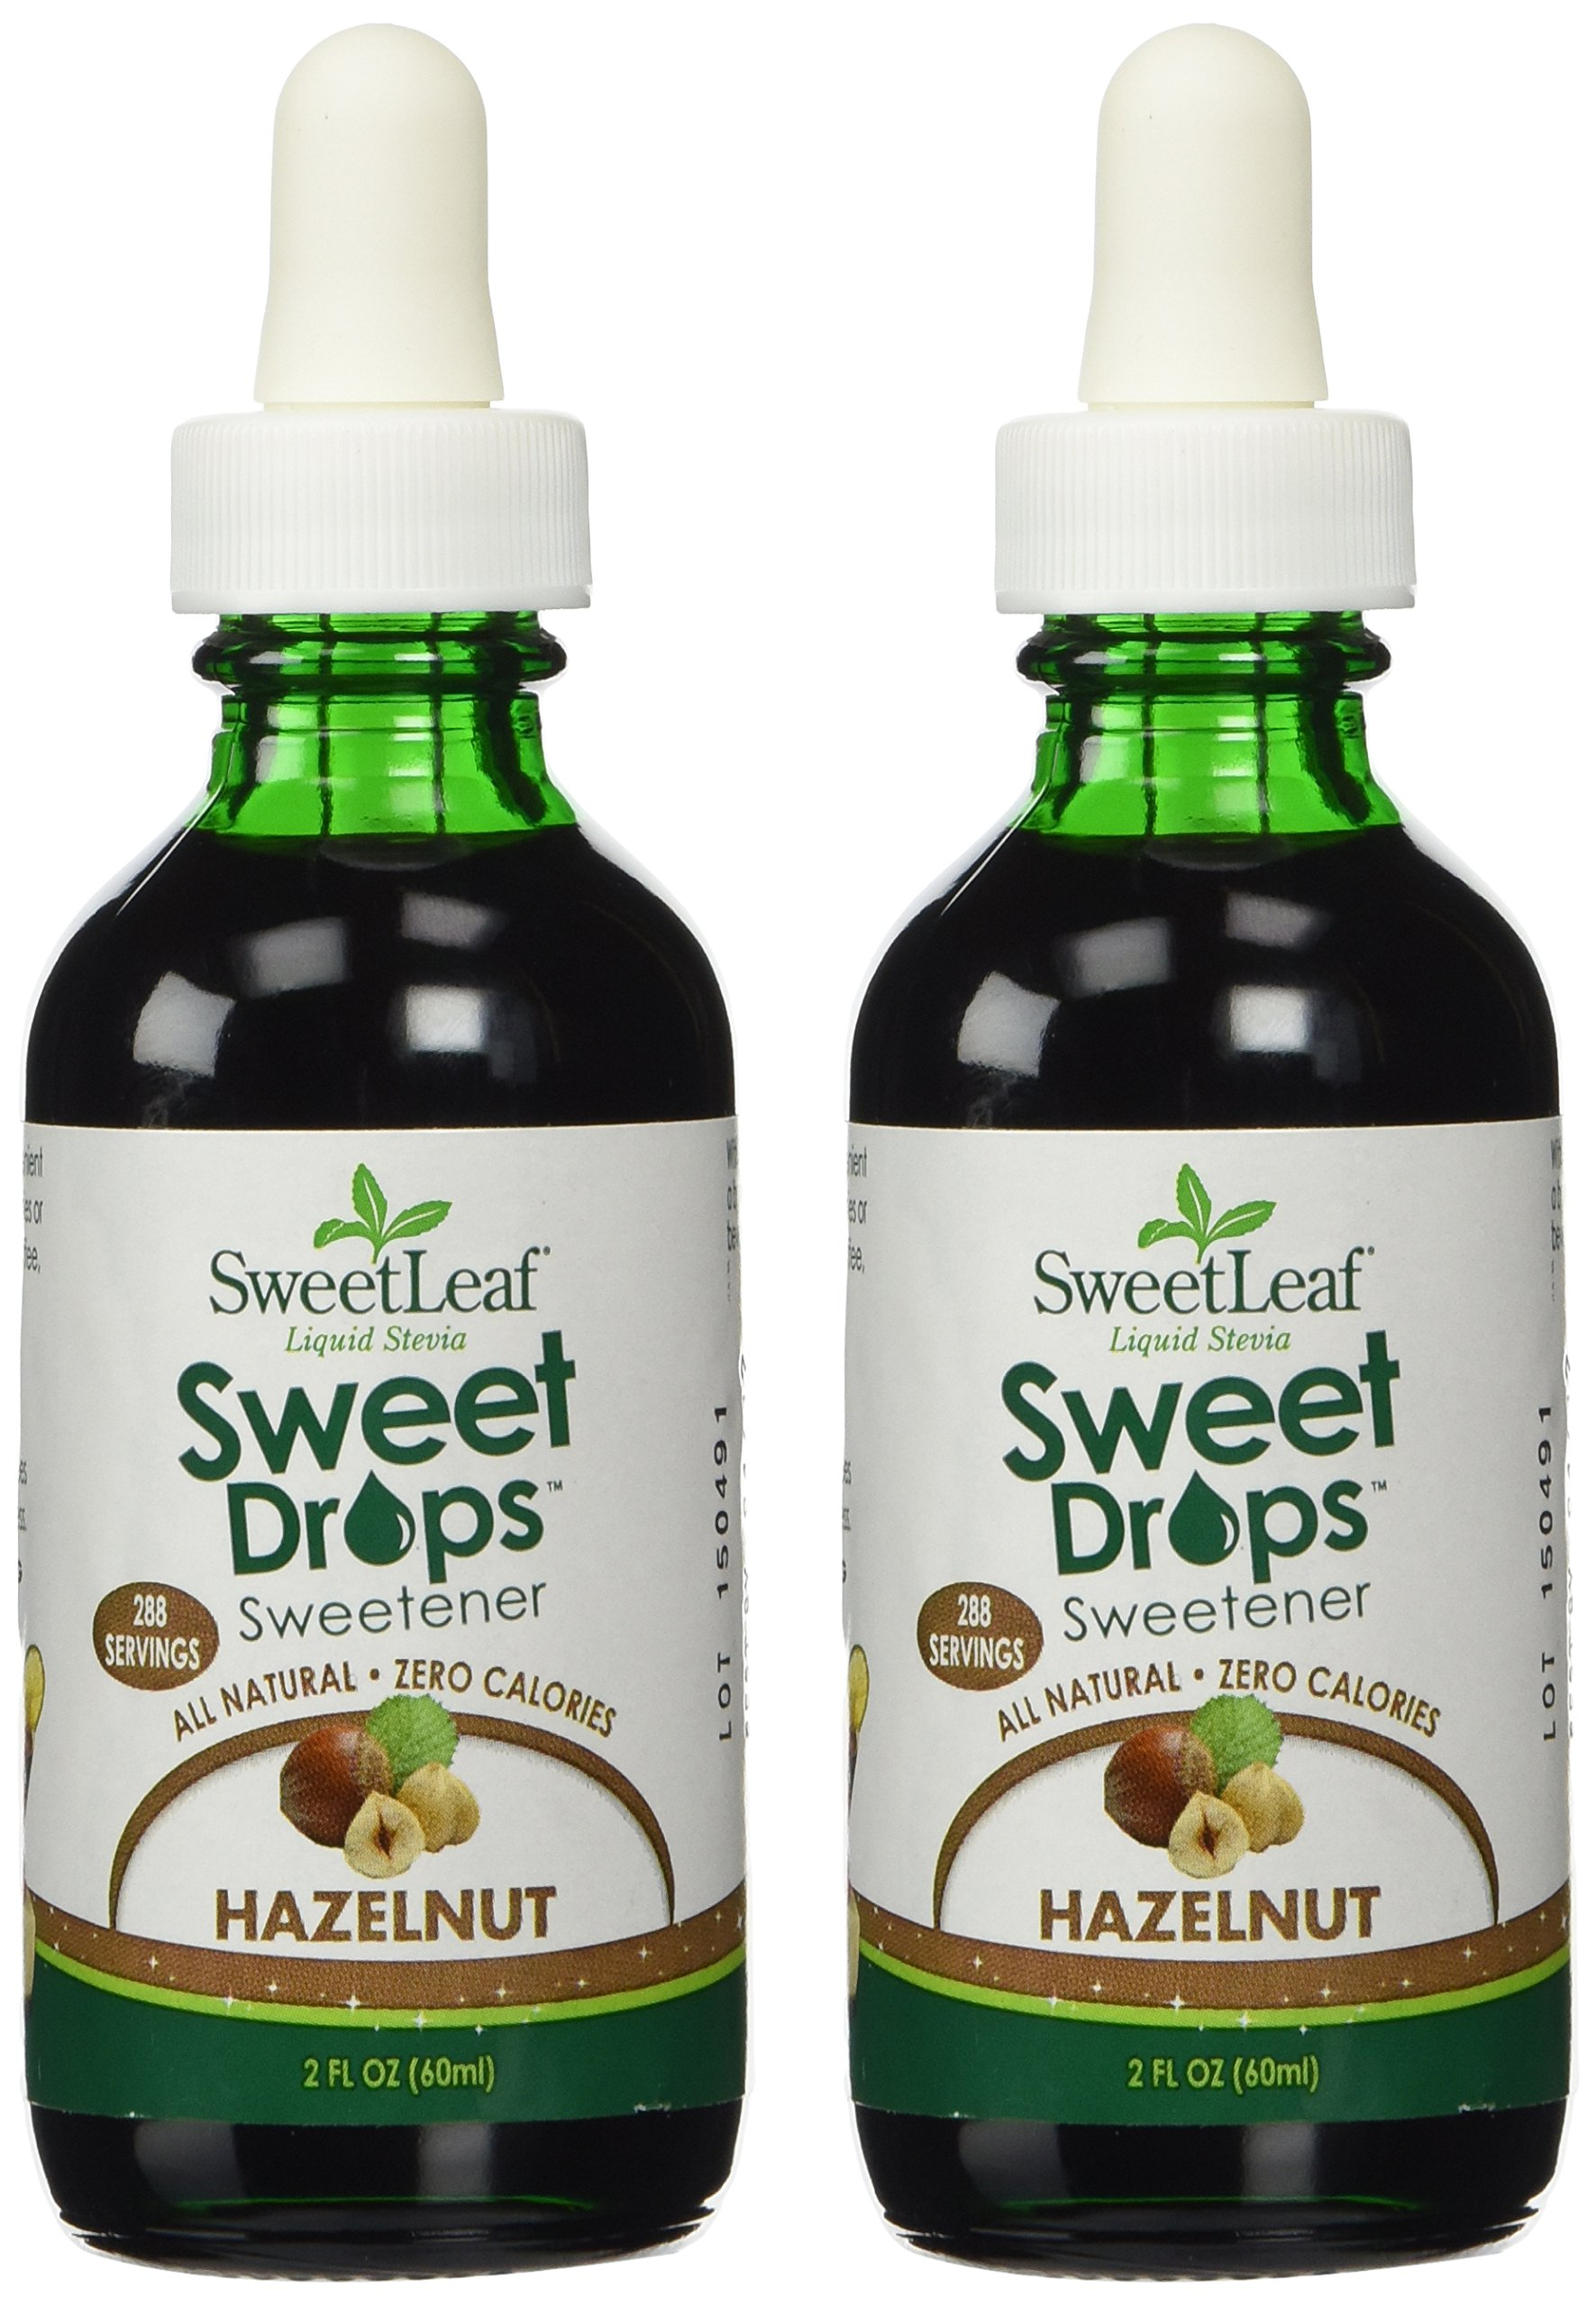 SweetLeaf Hazelnut Liquid Stevia, 2 Ounce Bottles (Pack of 2)